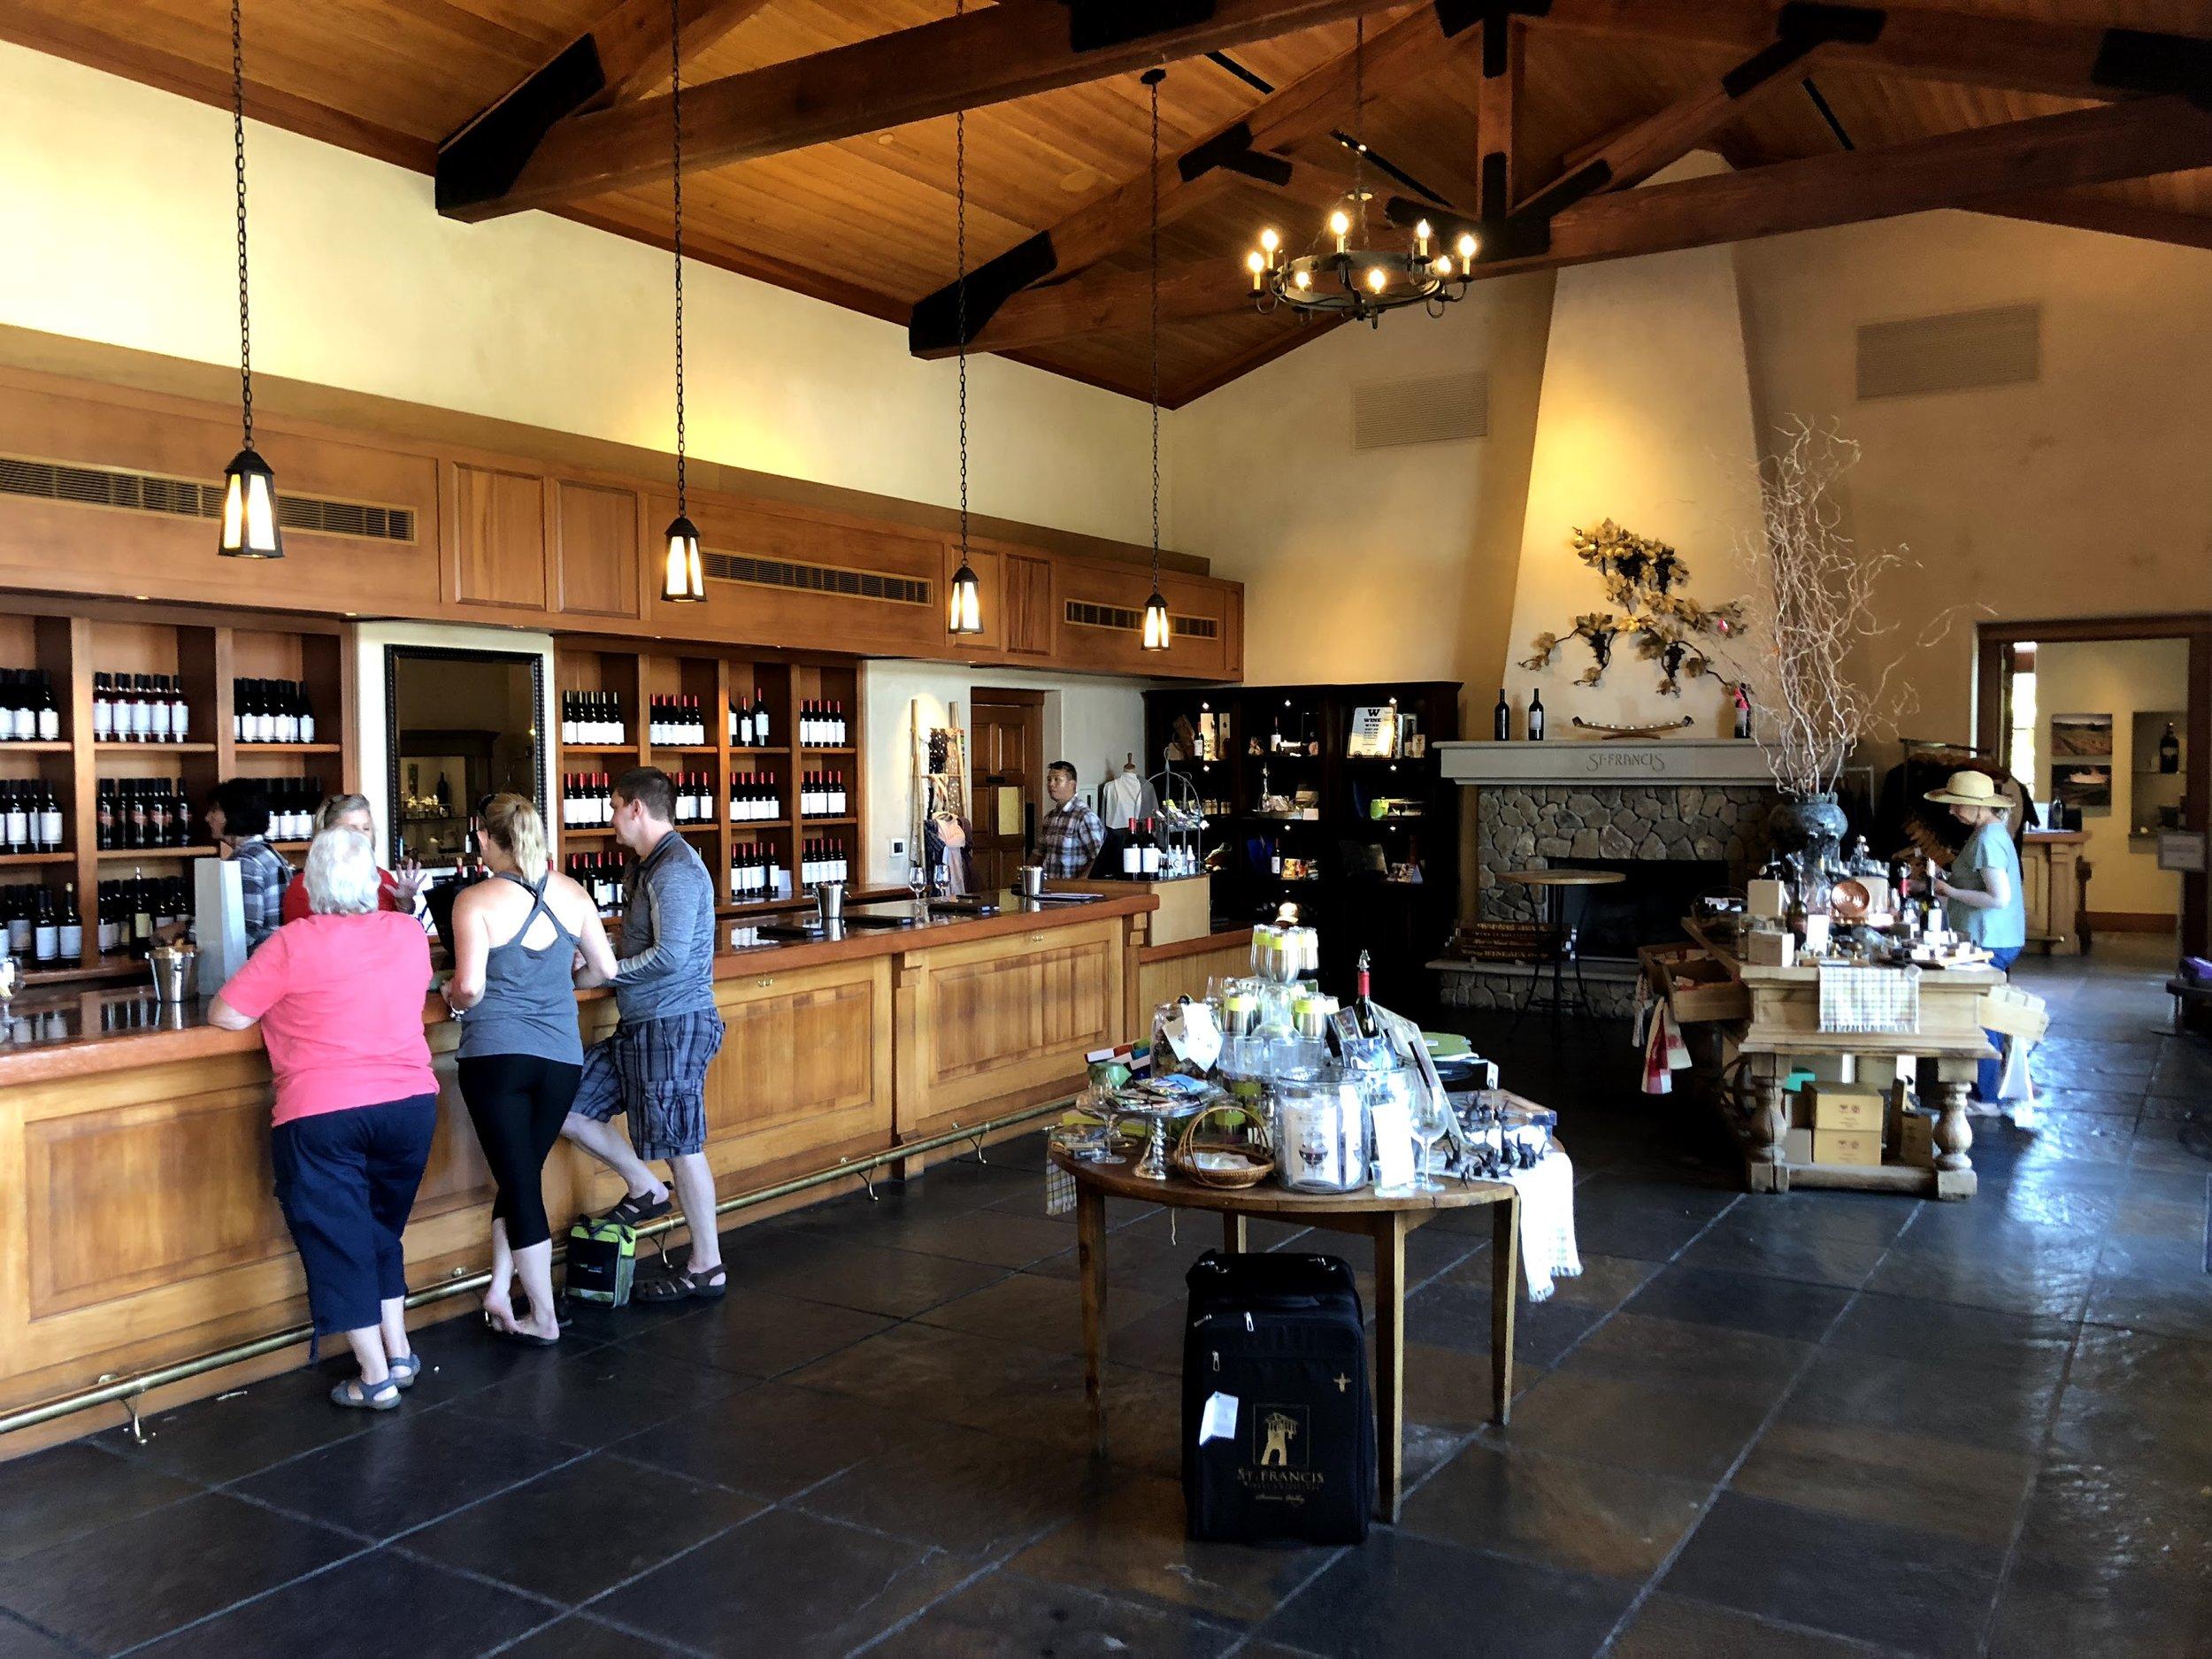 Tasting room at St. Francis Winery